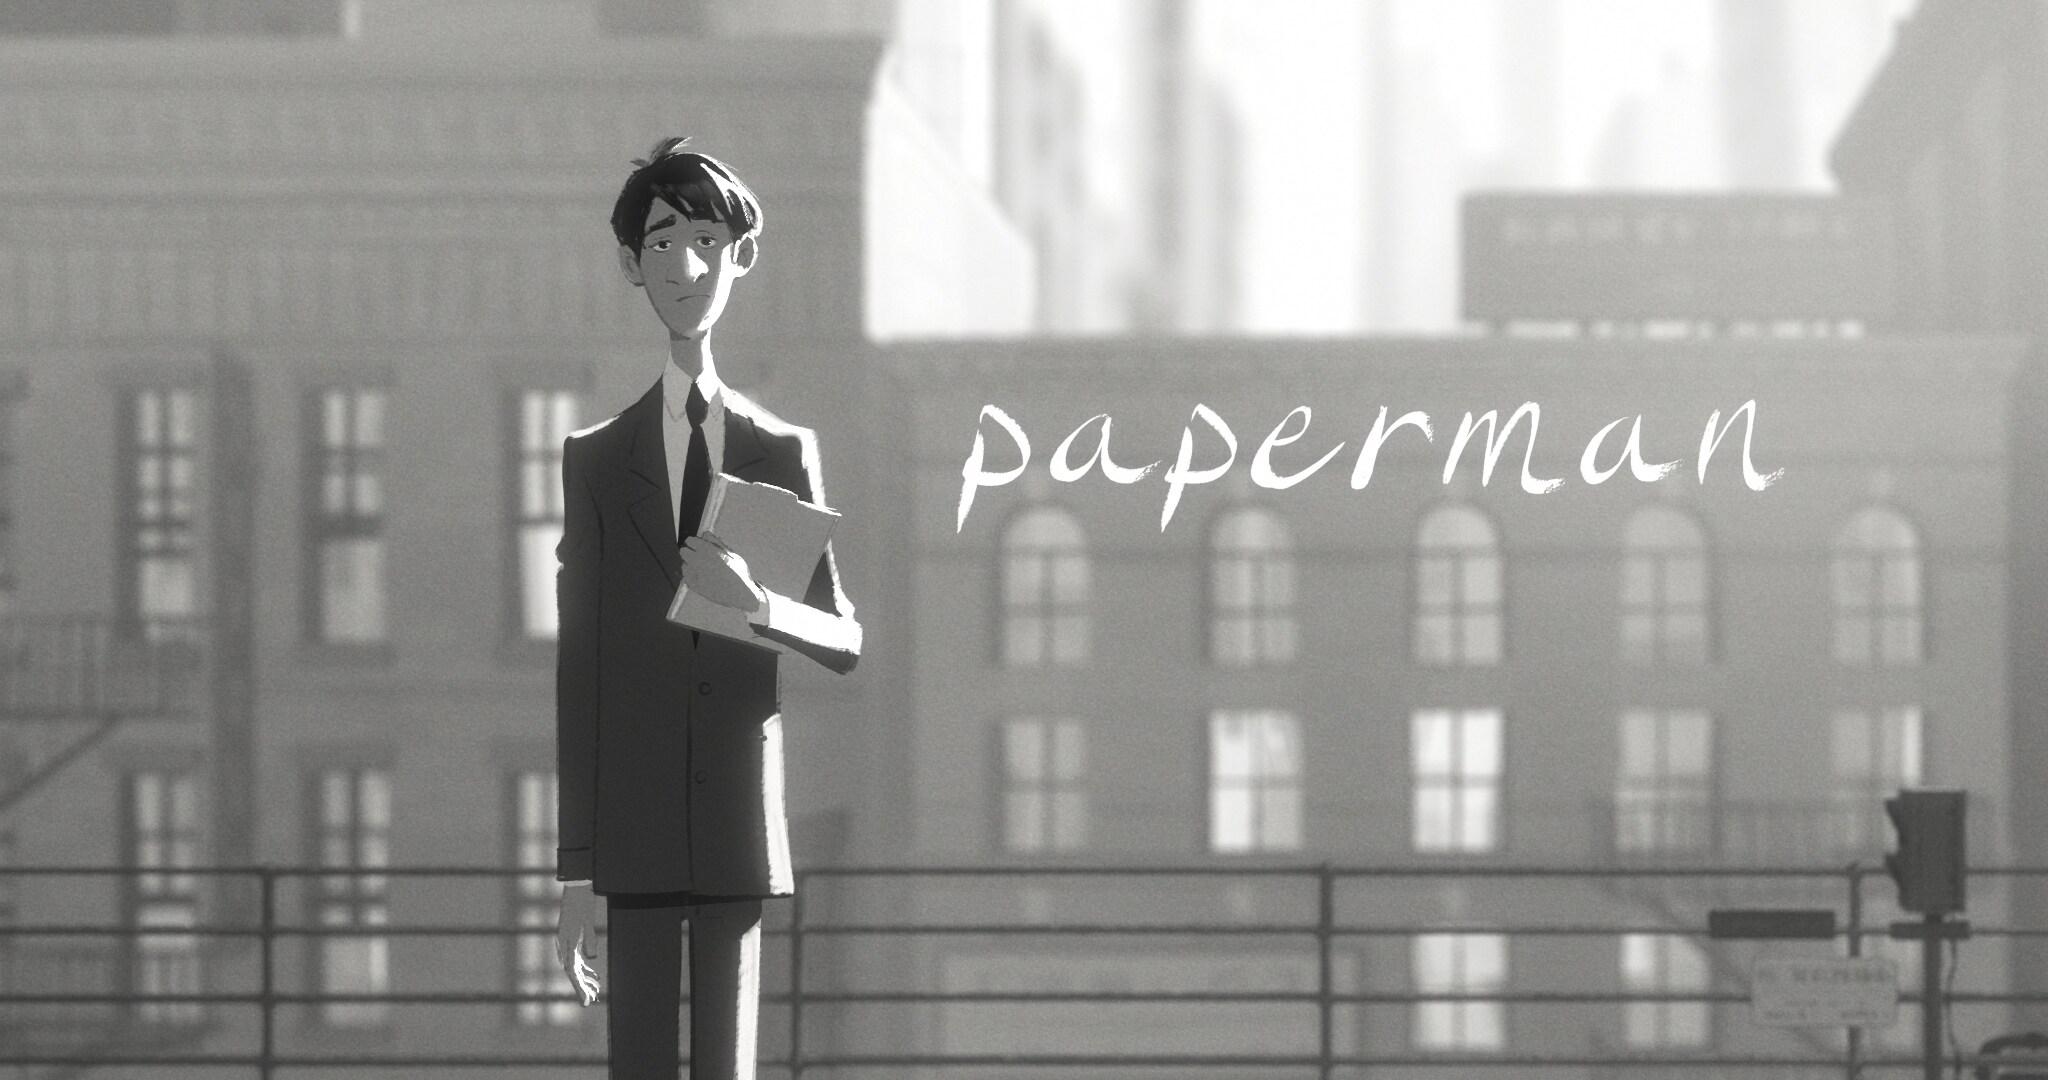 Paperman - Walt Disney Animation Studios Short Films Collection